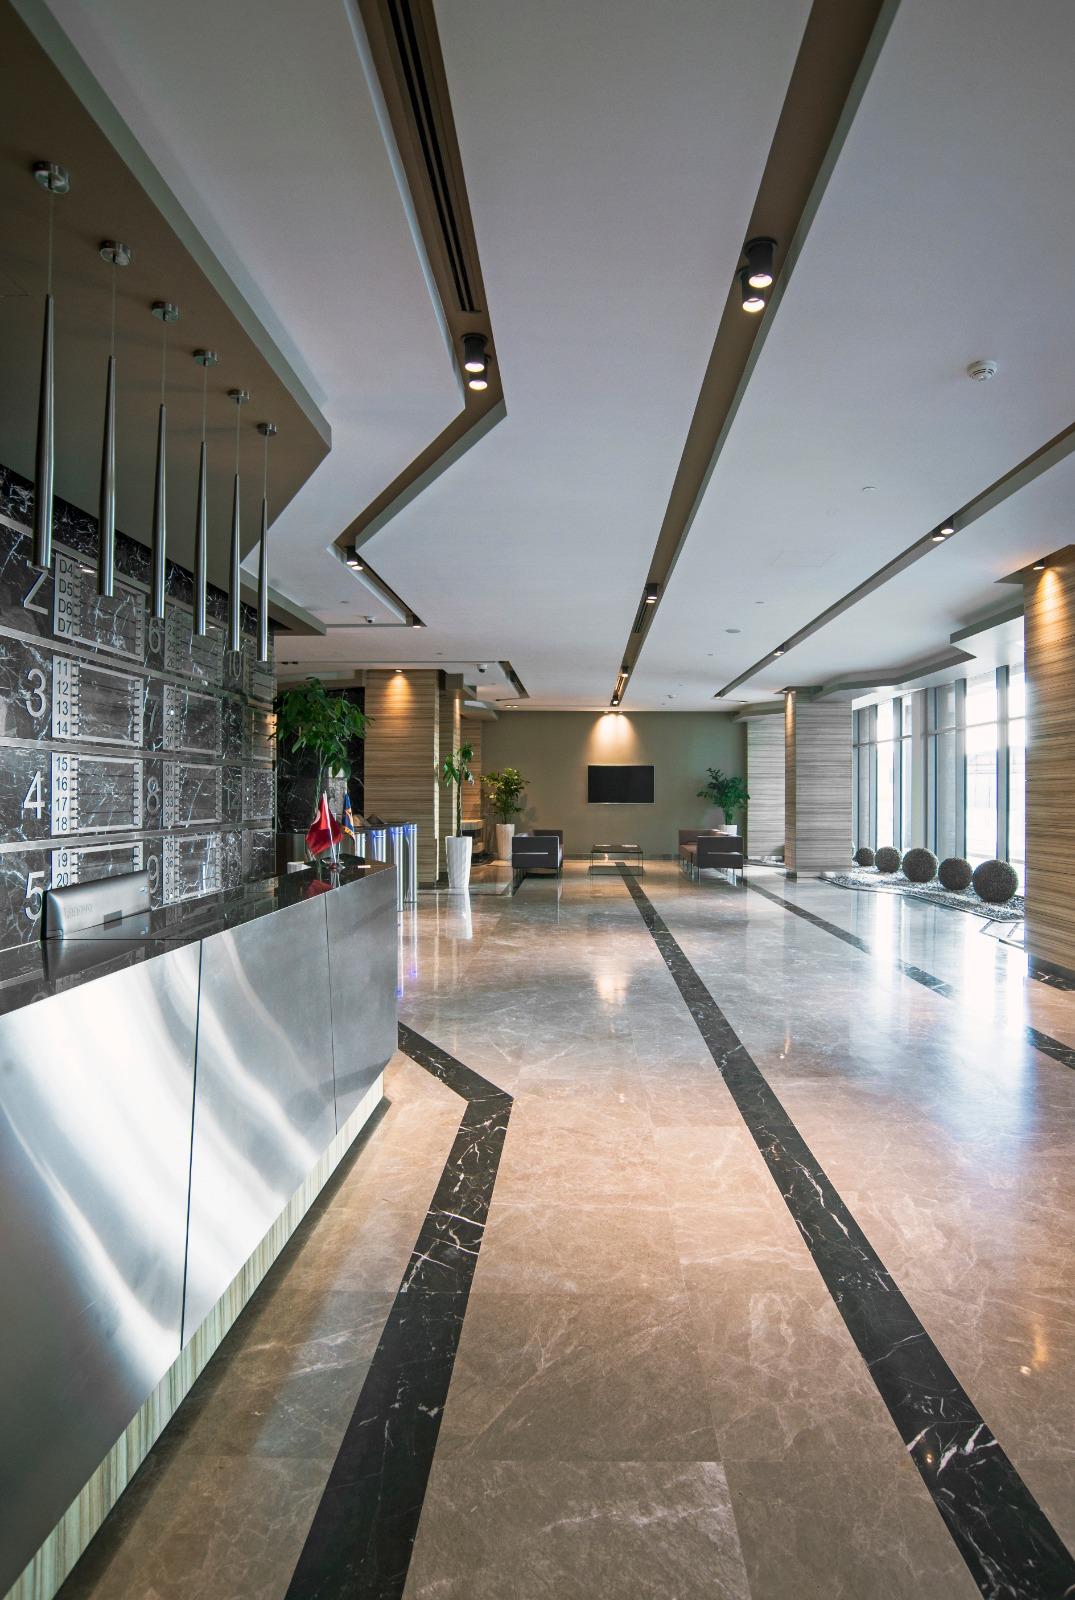 Бизнес-центр с жилыми апартаментами в Атакёе - Фото 23